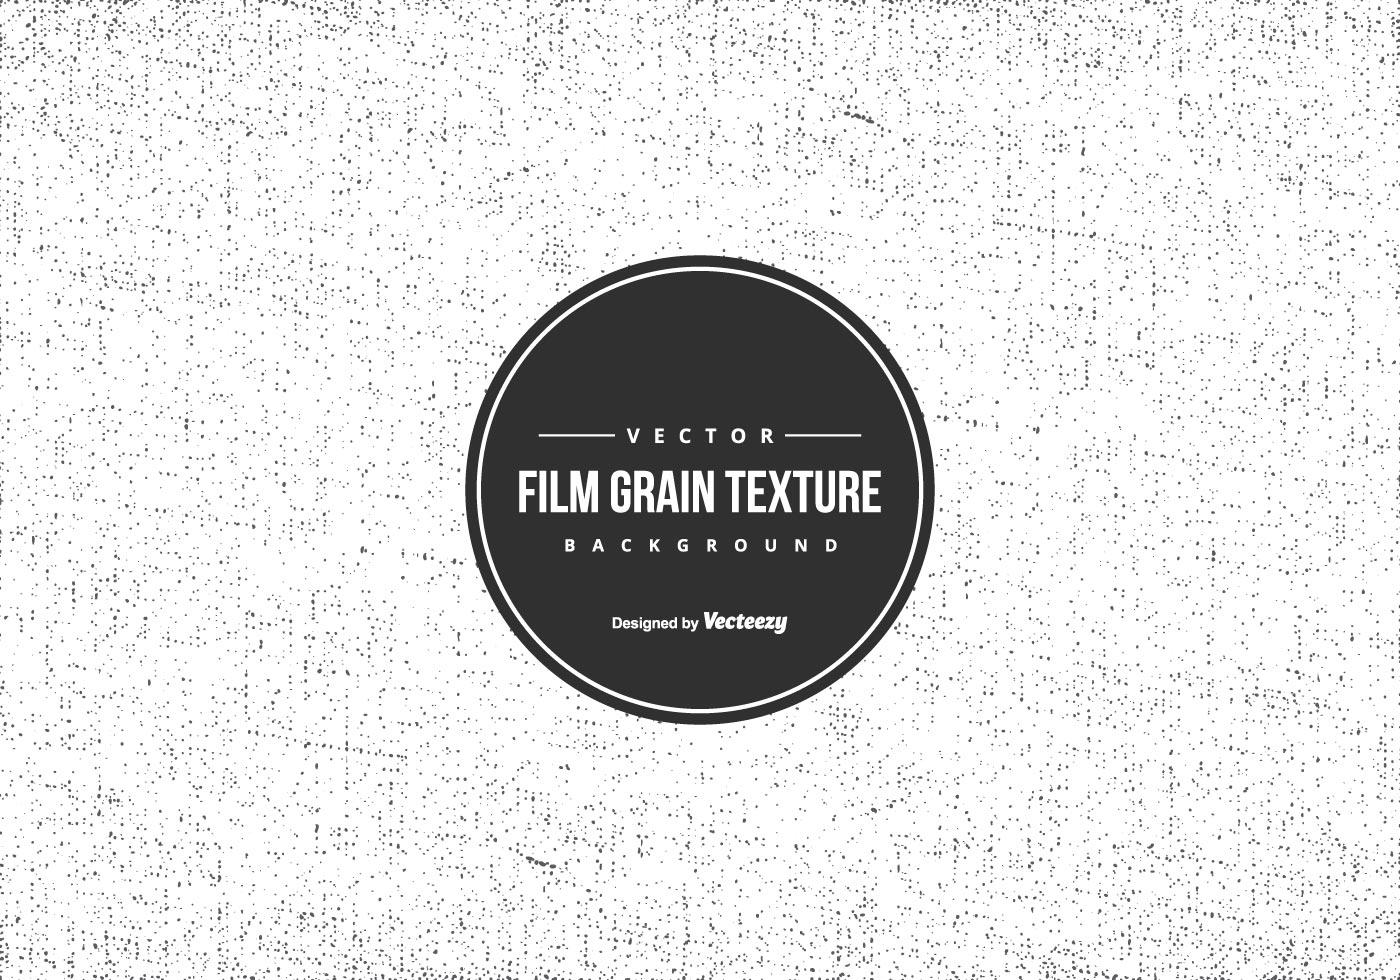 Film Grain Texture Free Vector Art